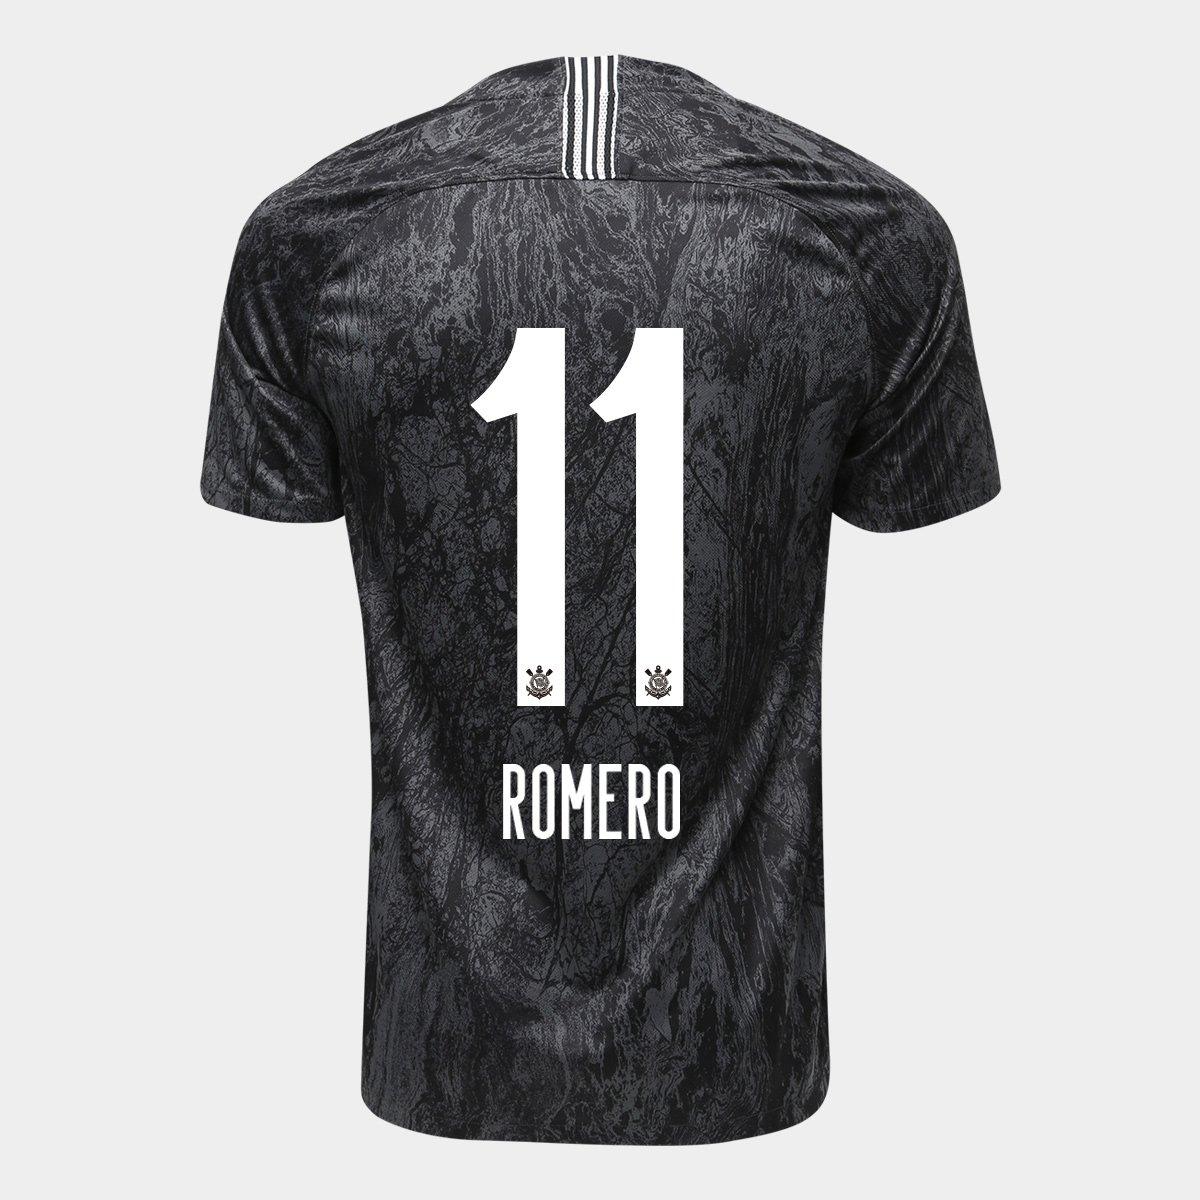 Camisa Corinthians II 18 19 Nº 11 Romero - Torcedor Nike Masculina - Compre  Agora  25325fadabdcb